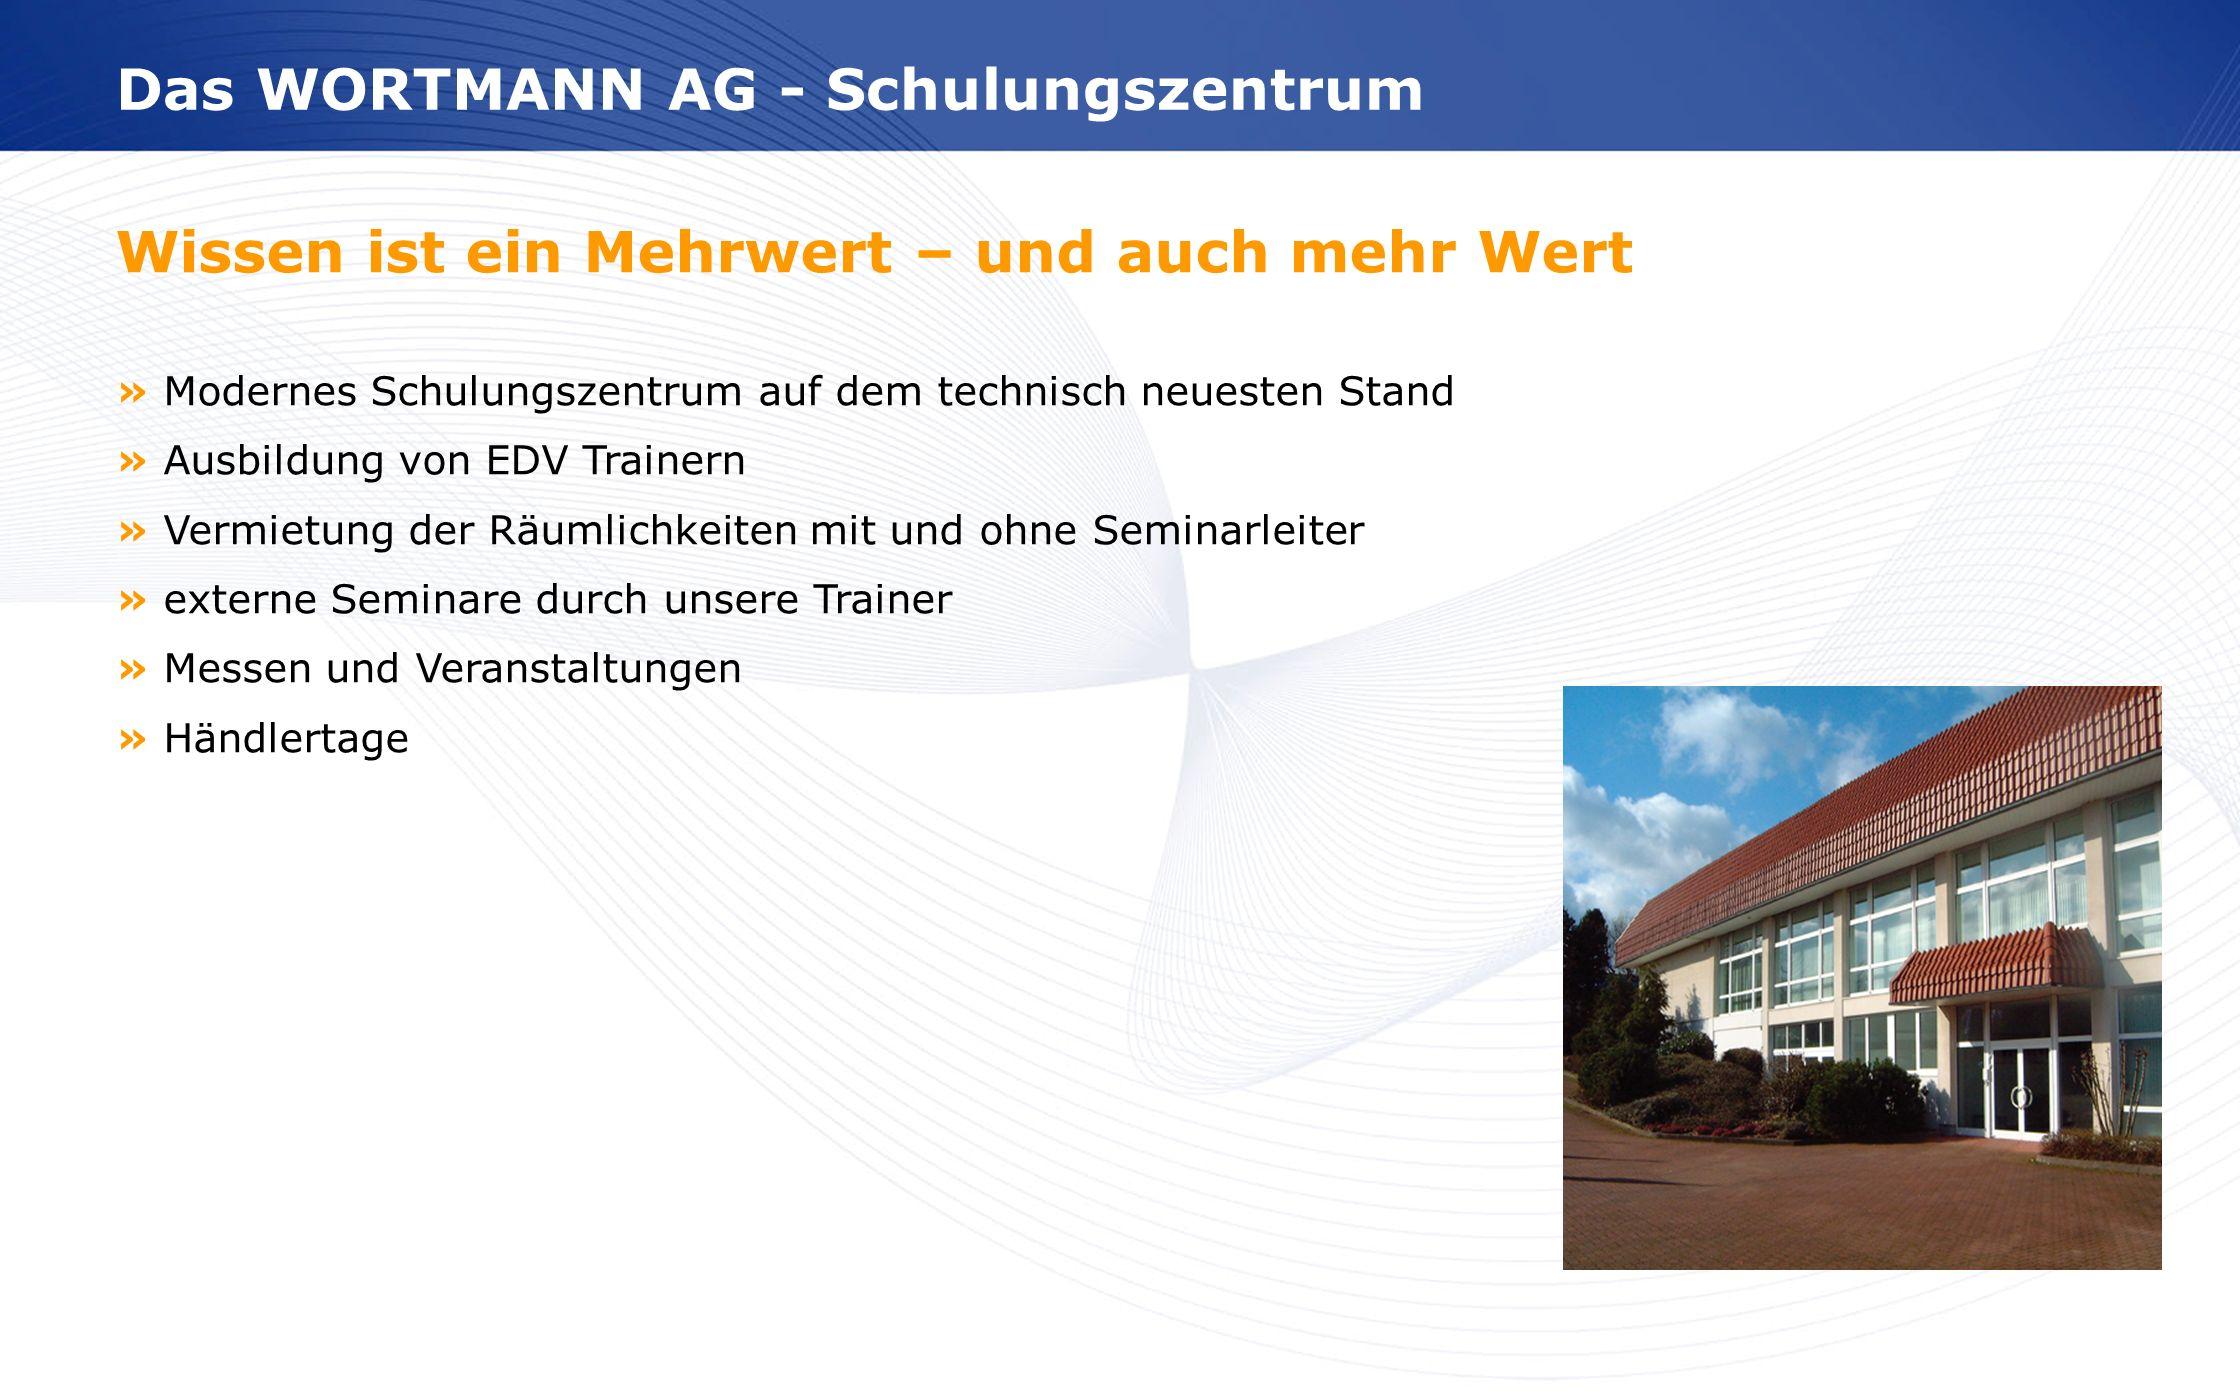 Das WORTMANN AG - Schulungszentrum